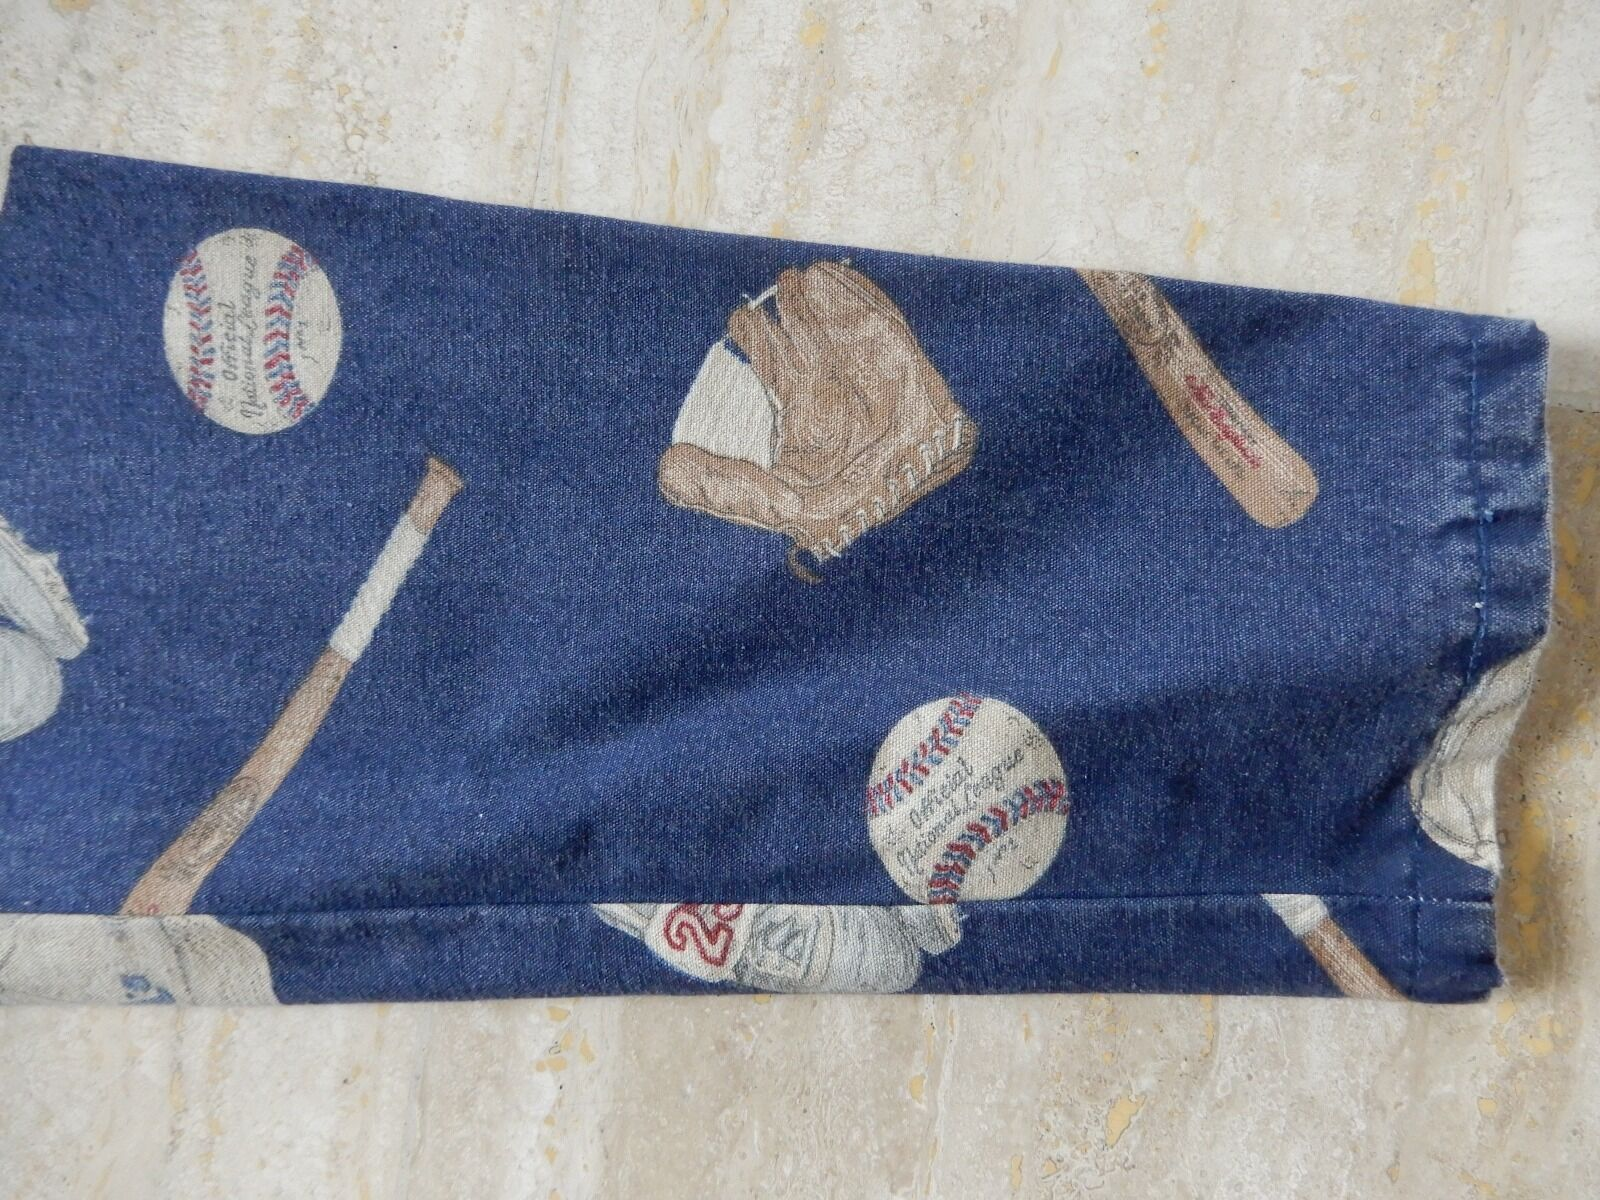 Ausgefallene Ausgefallene Ausgefallene bedruckte Jeans ital.Gr.44 (36 38) IRS b3e857